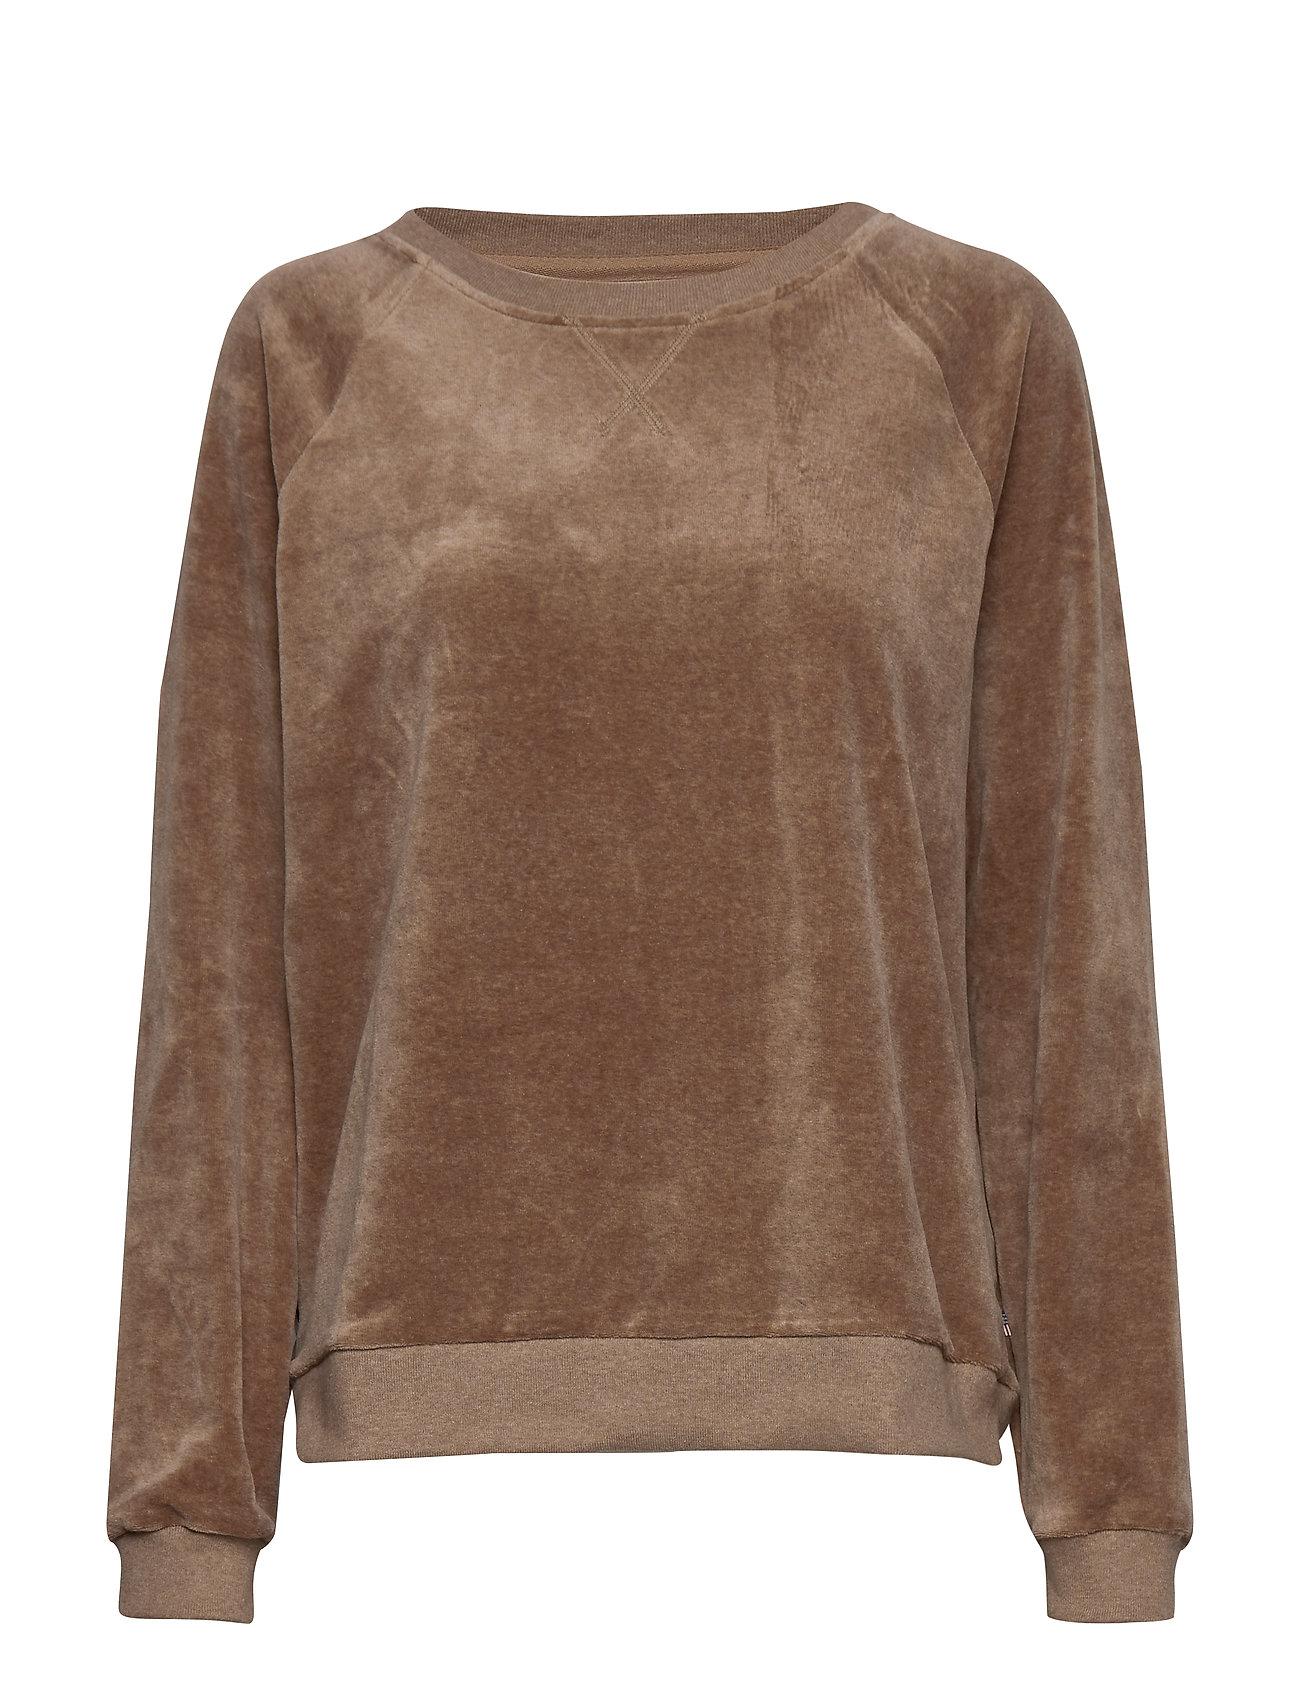 Lexington Clothing Martha Velour Sweatshirt - BEIGE MELANGE